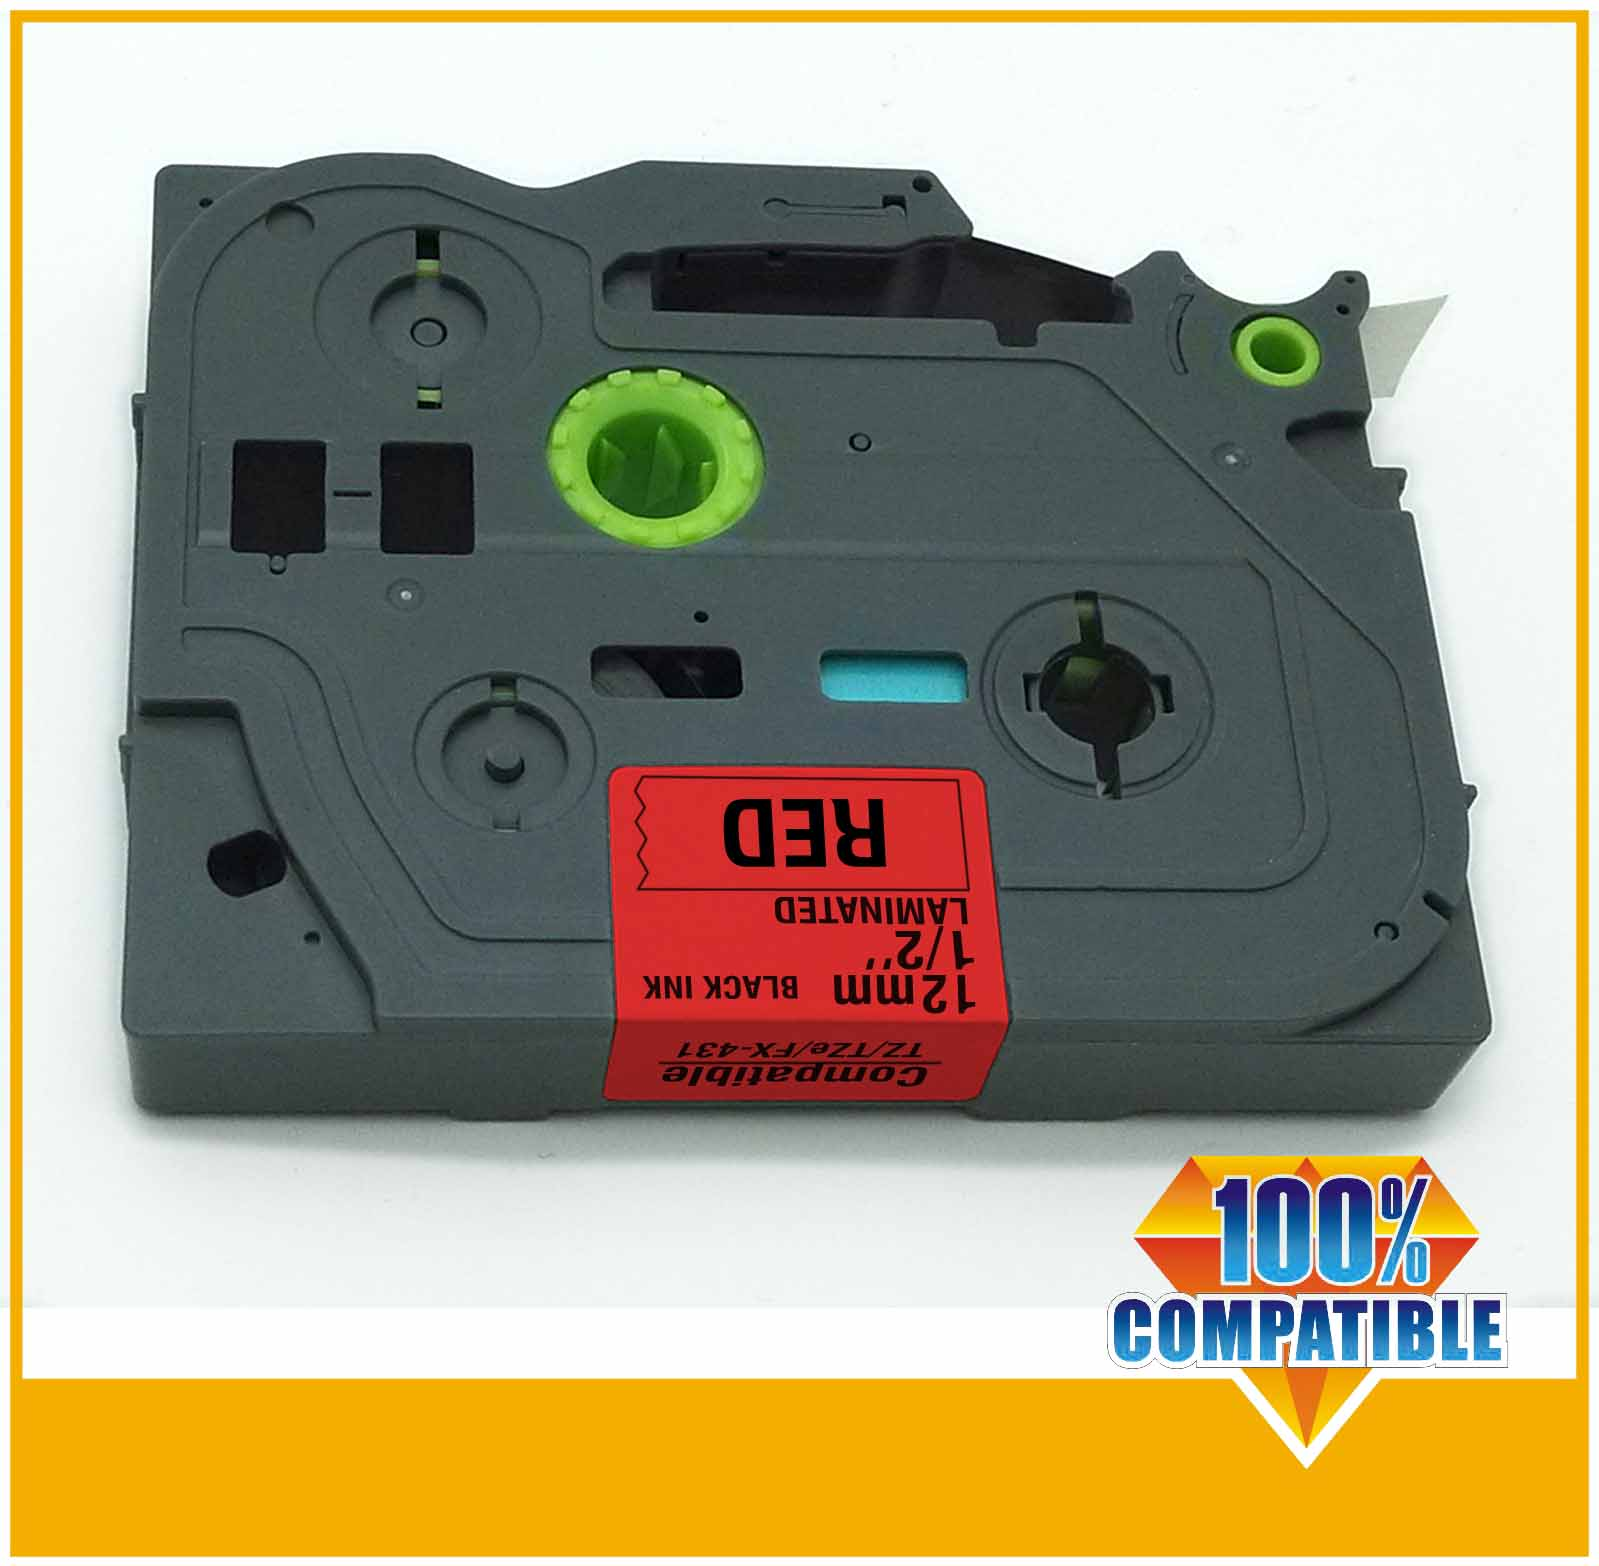 p touch TZ431 P-Touch Label Tape PT-S431 printer ribbons_Printer cartridge